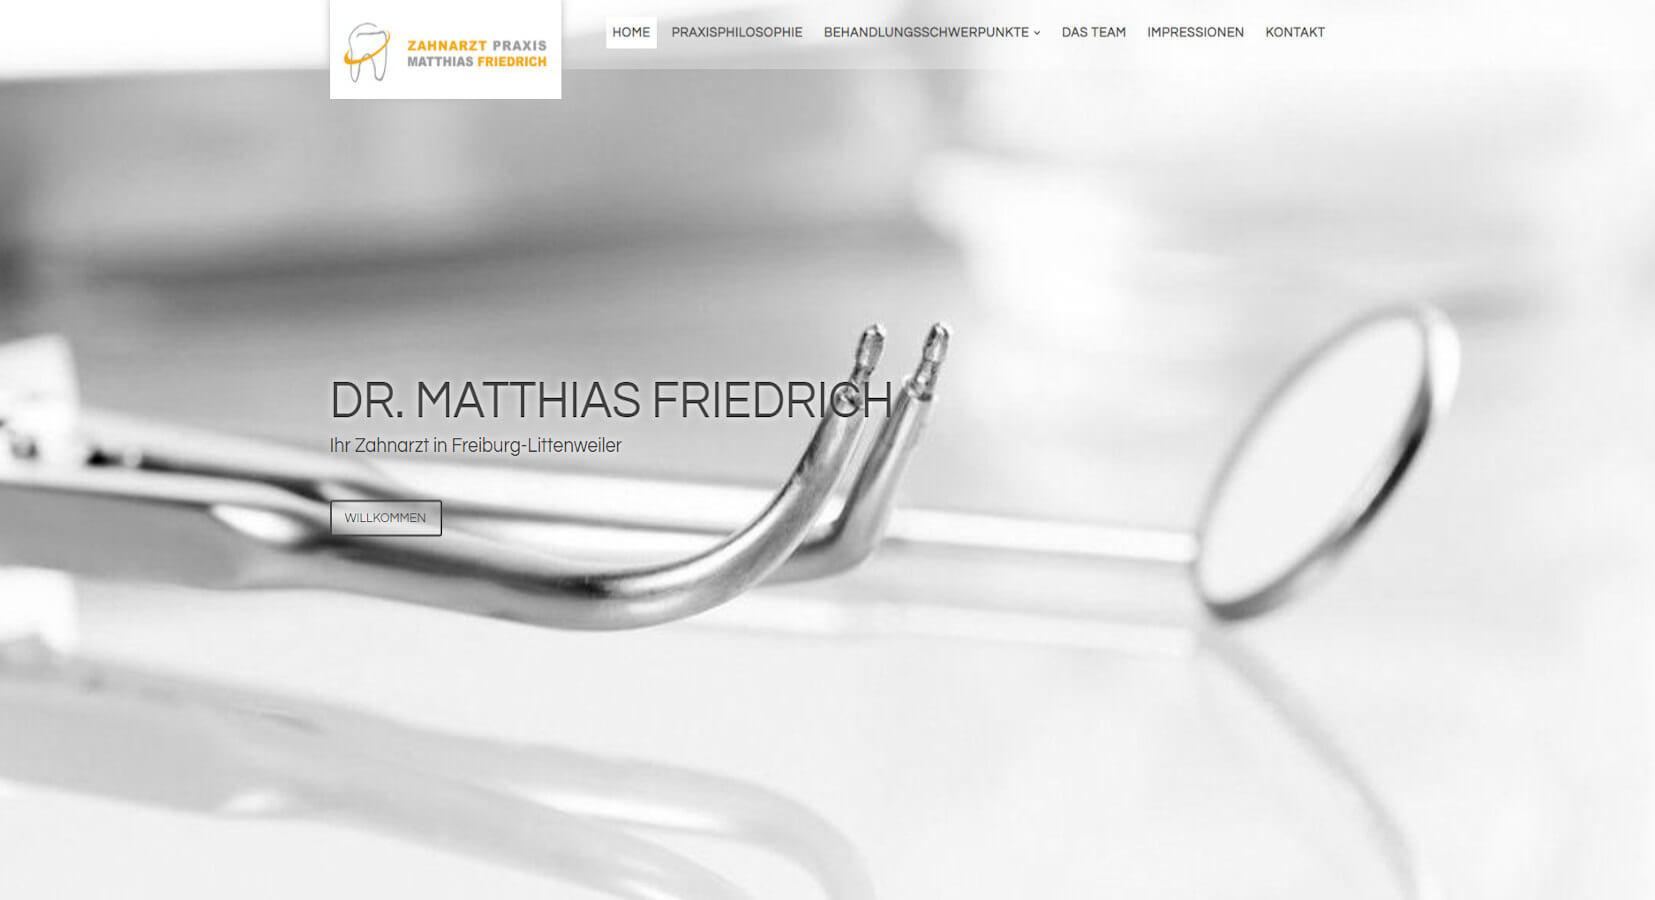 Zahnarzt Praxis Matthias Friedrich